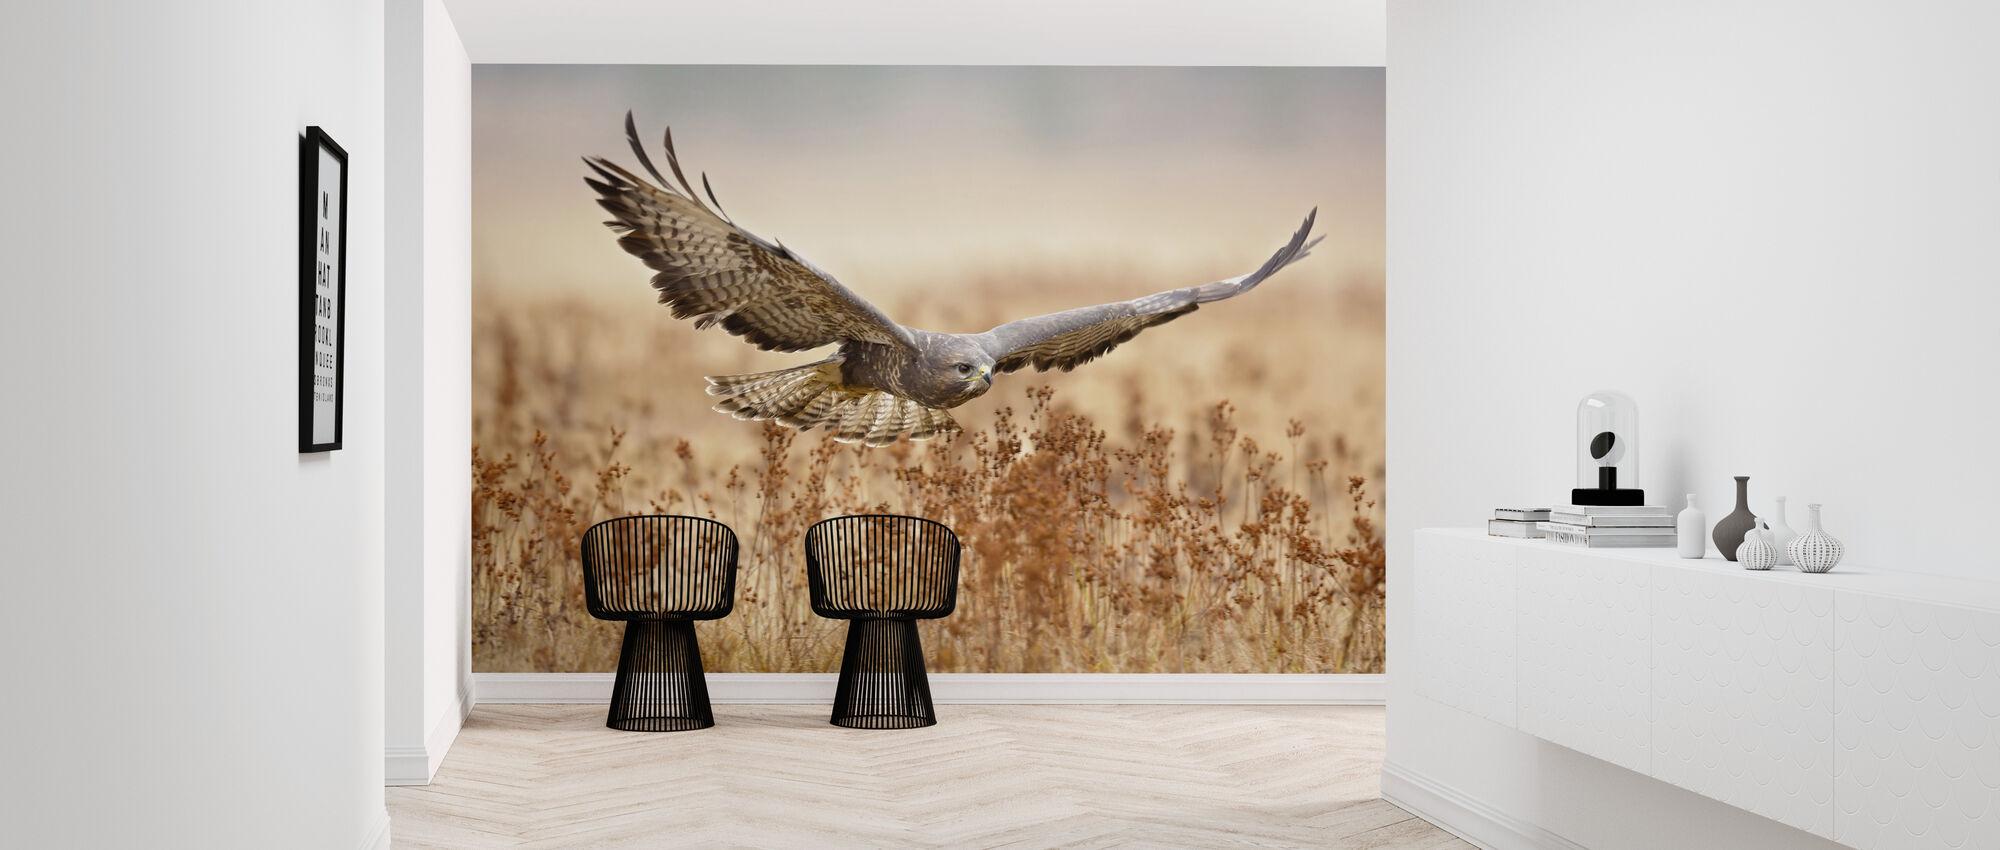 Common Buzzard - Wallpaper - Hallway